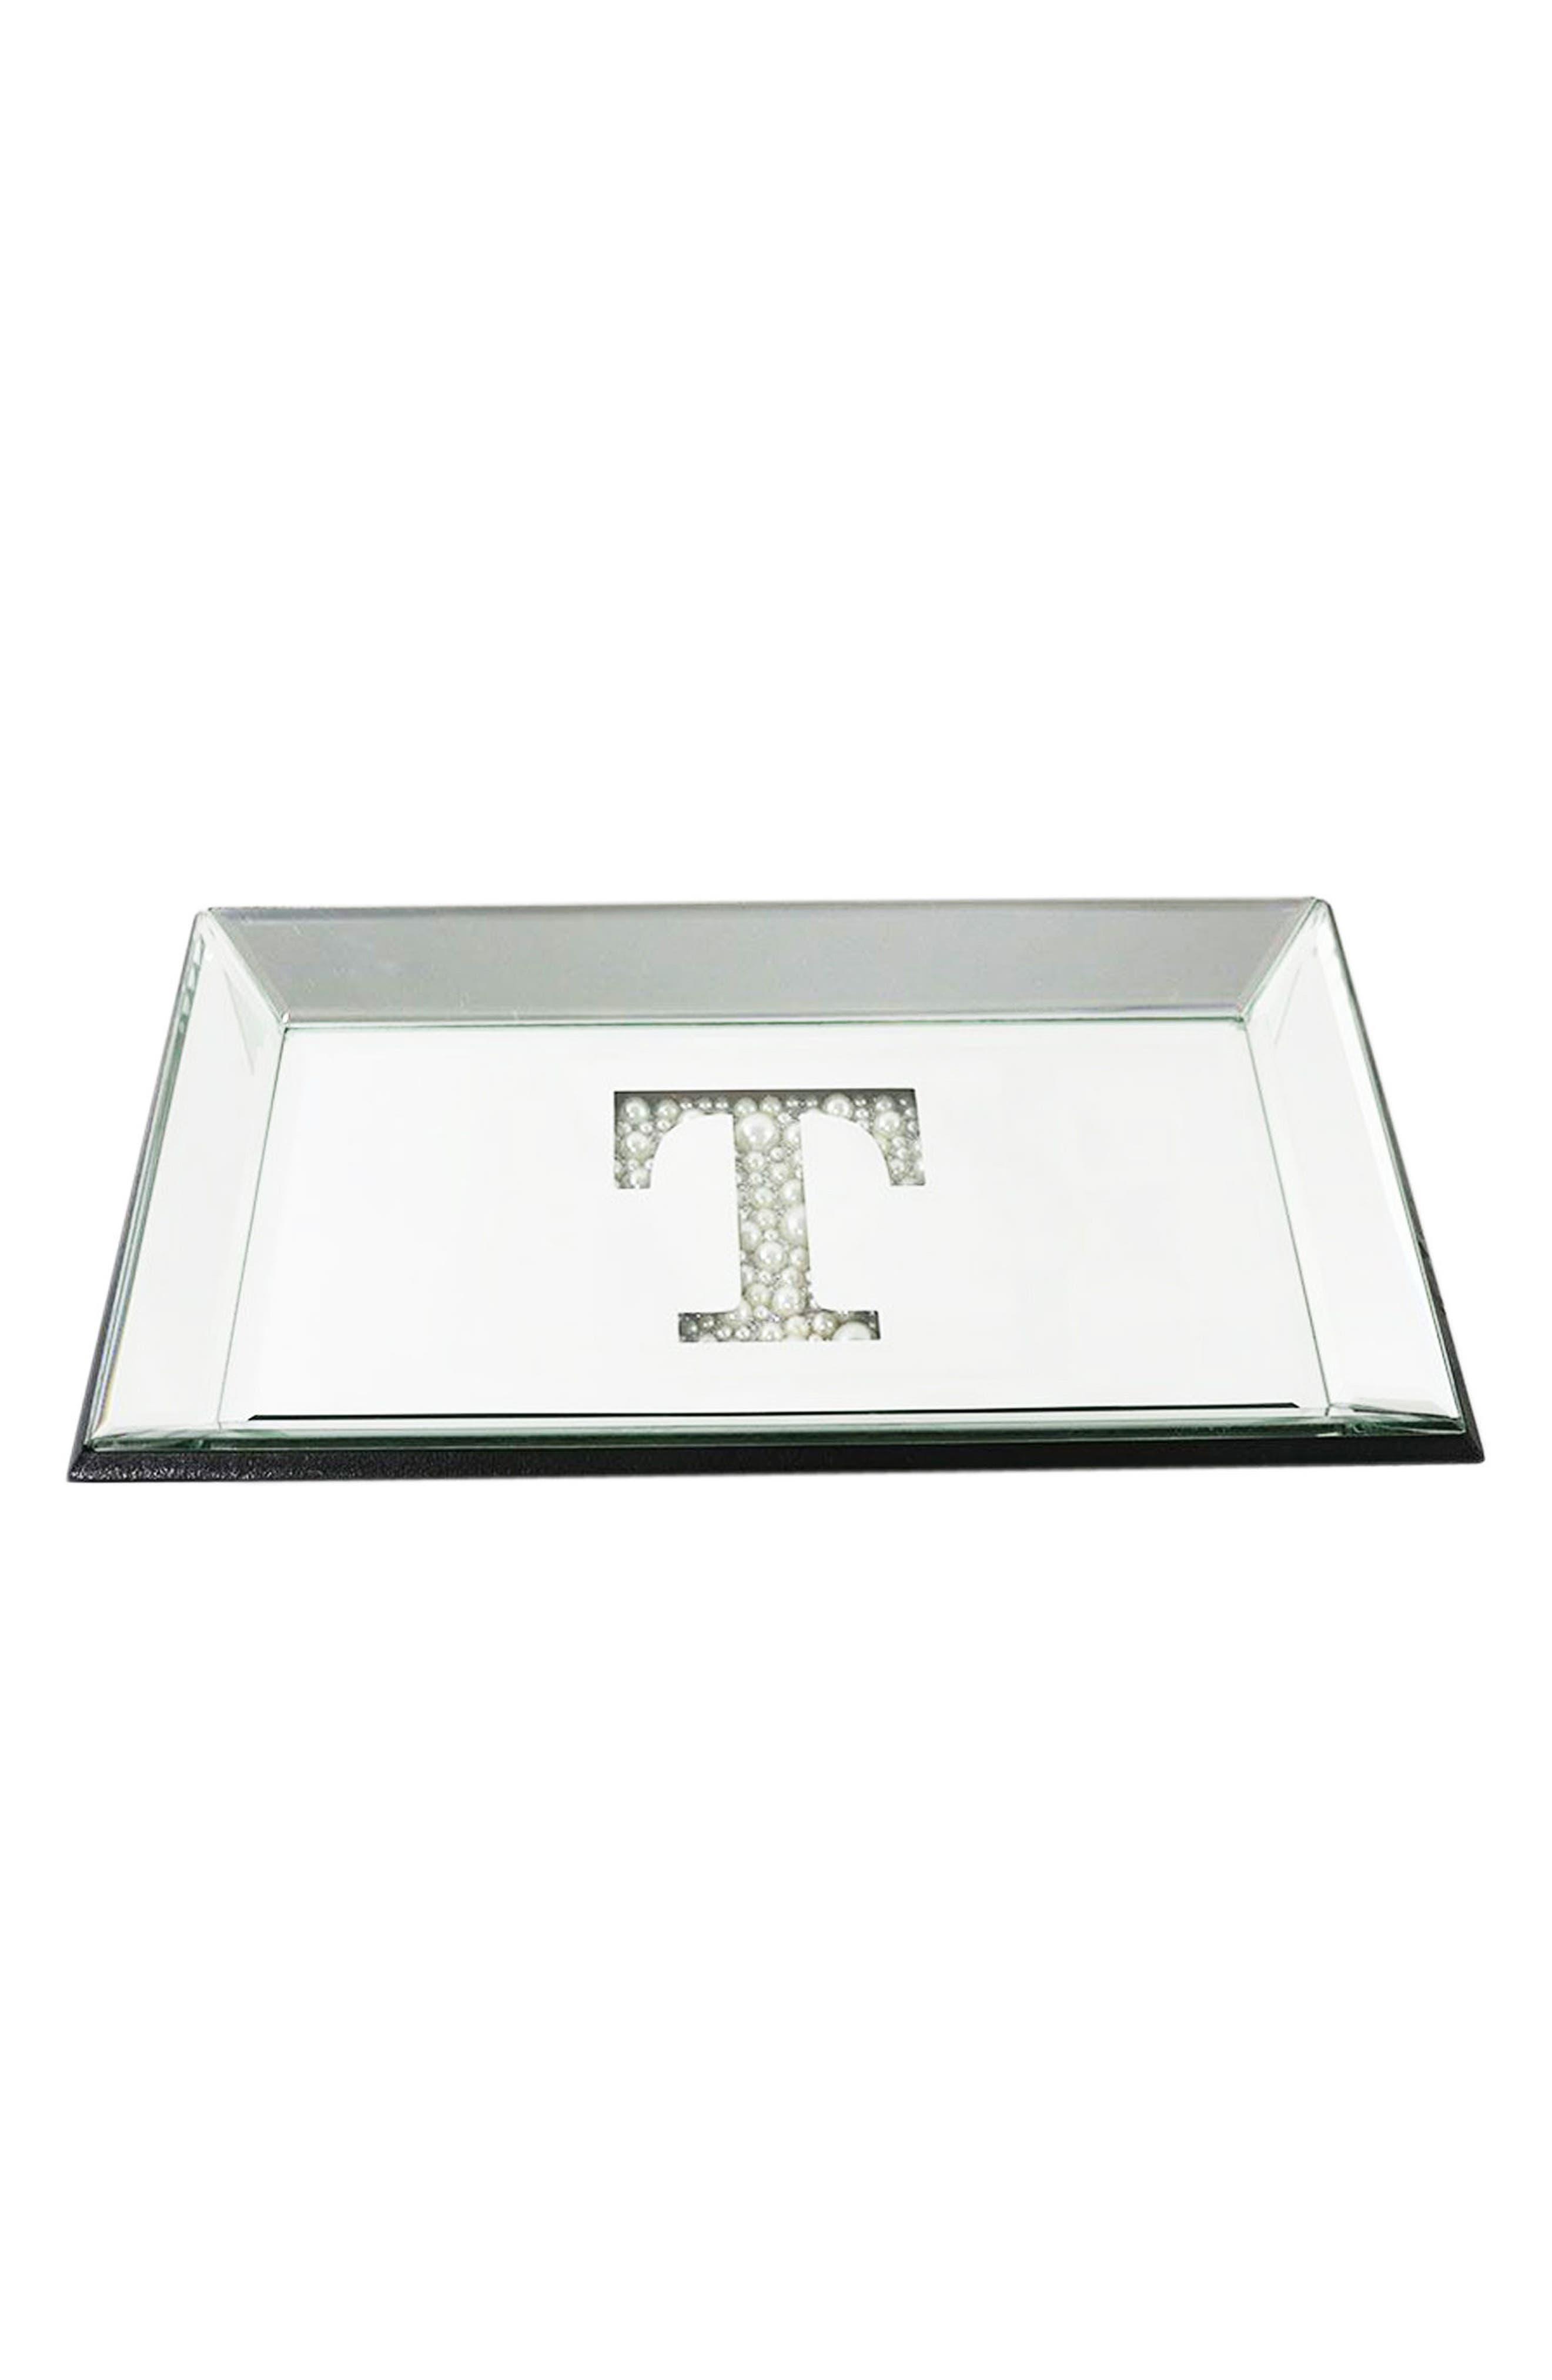 AMERICAN ATELIER,                             Imitation Pearl Monogram Mirrored Trinket Tray,                             Main thumbnail 1, color,                             040